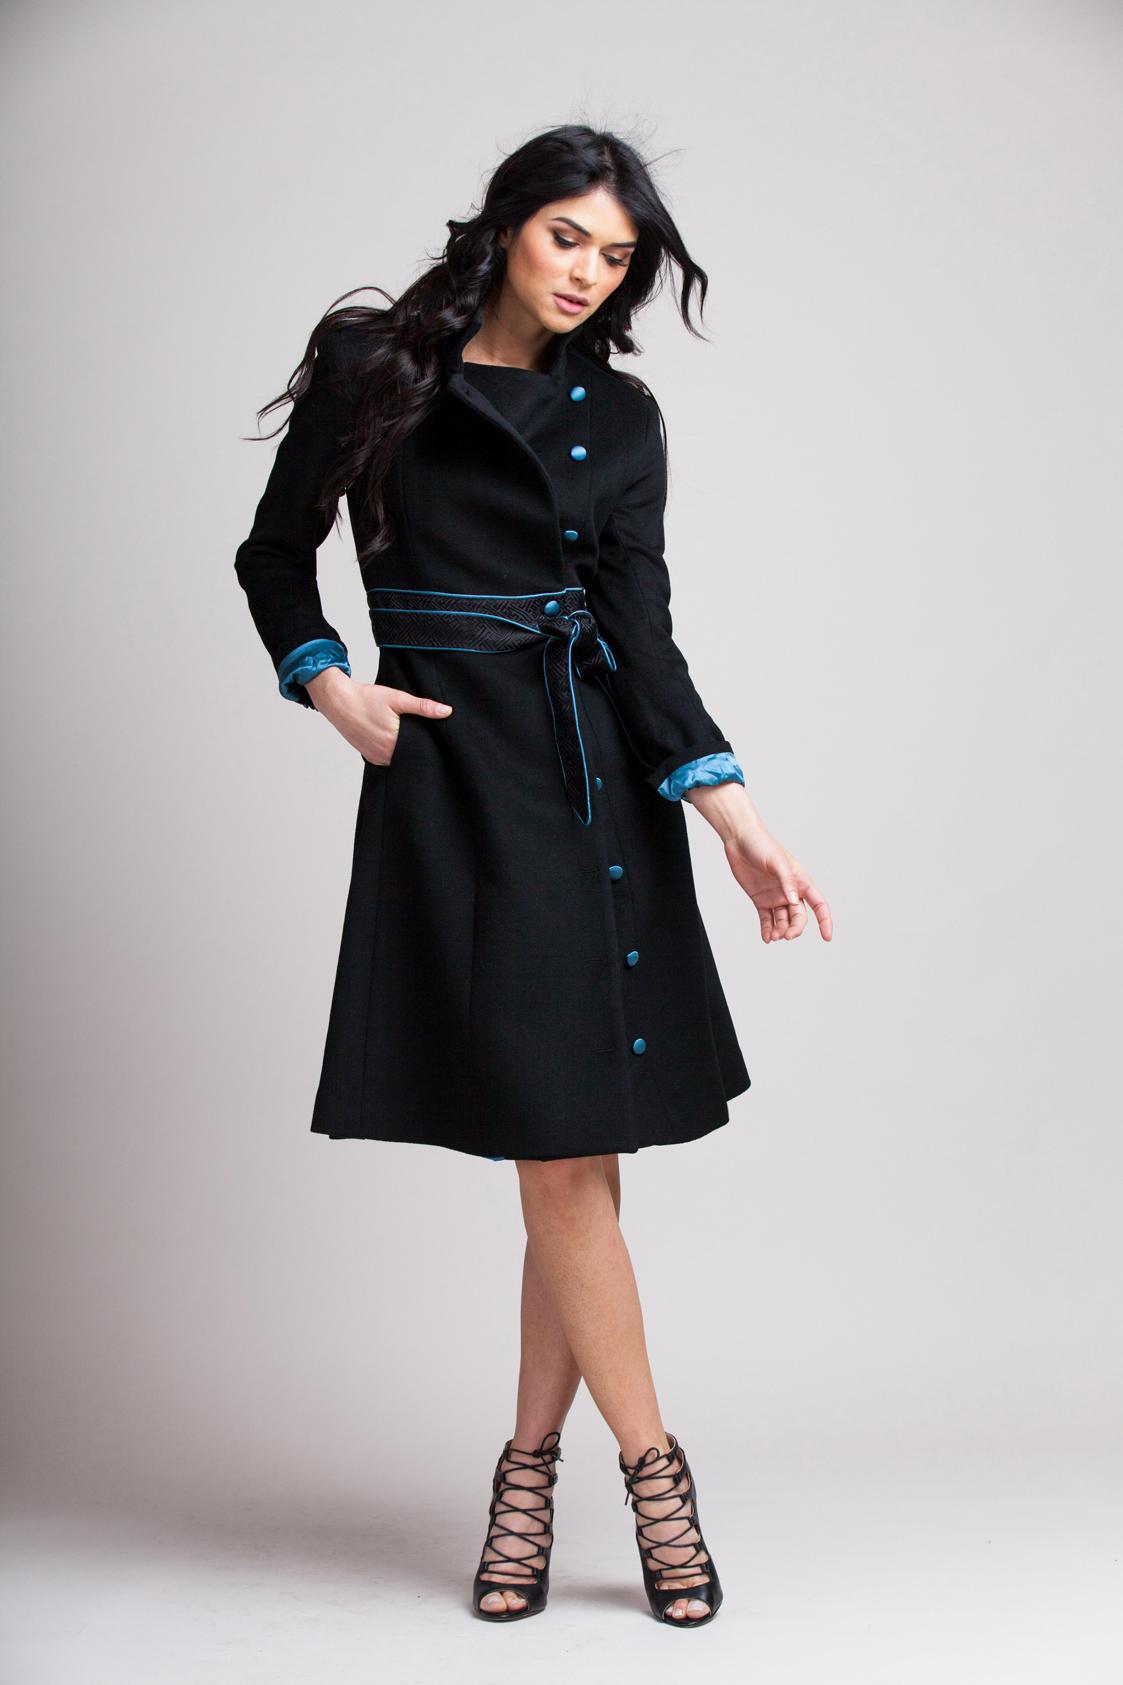 Azurean-Evening-Coat-Teresa-Crowninshield-Cashmere-Angora-Wool-Coat-Silk-Lining-Belted-Lapel03.jpg